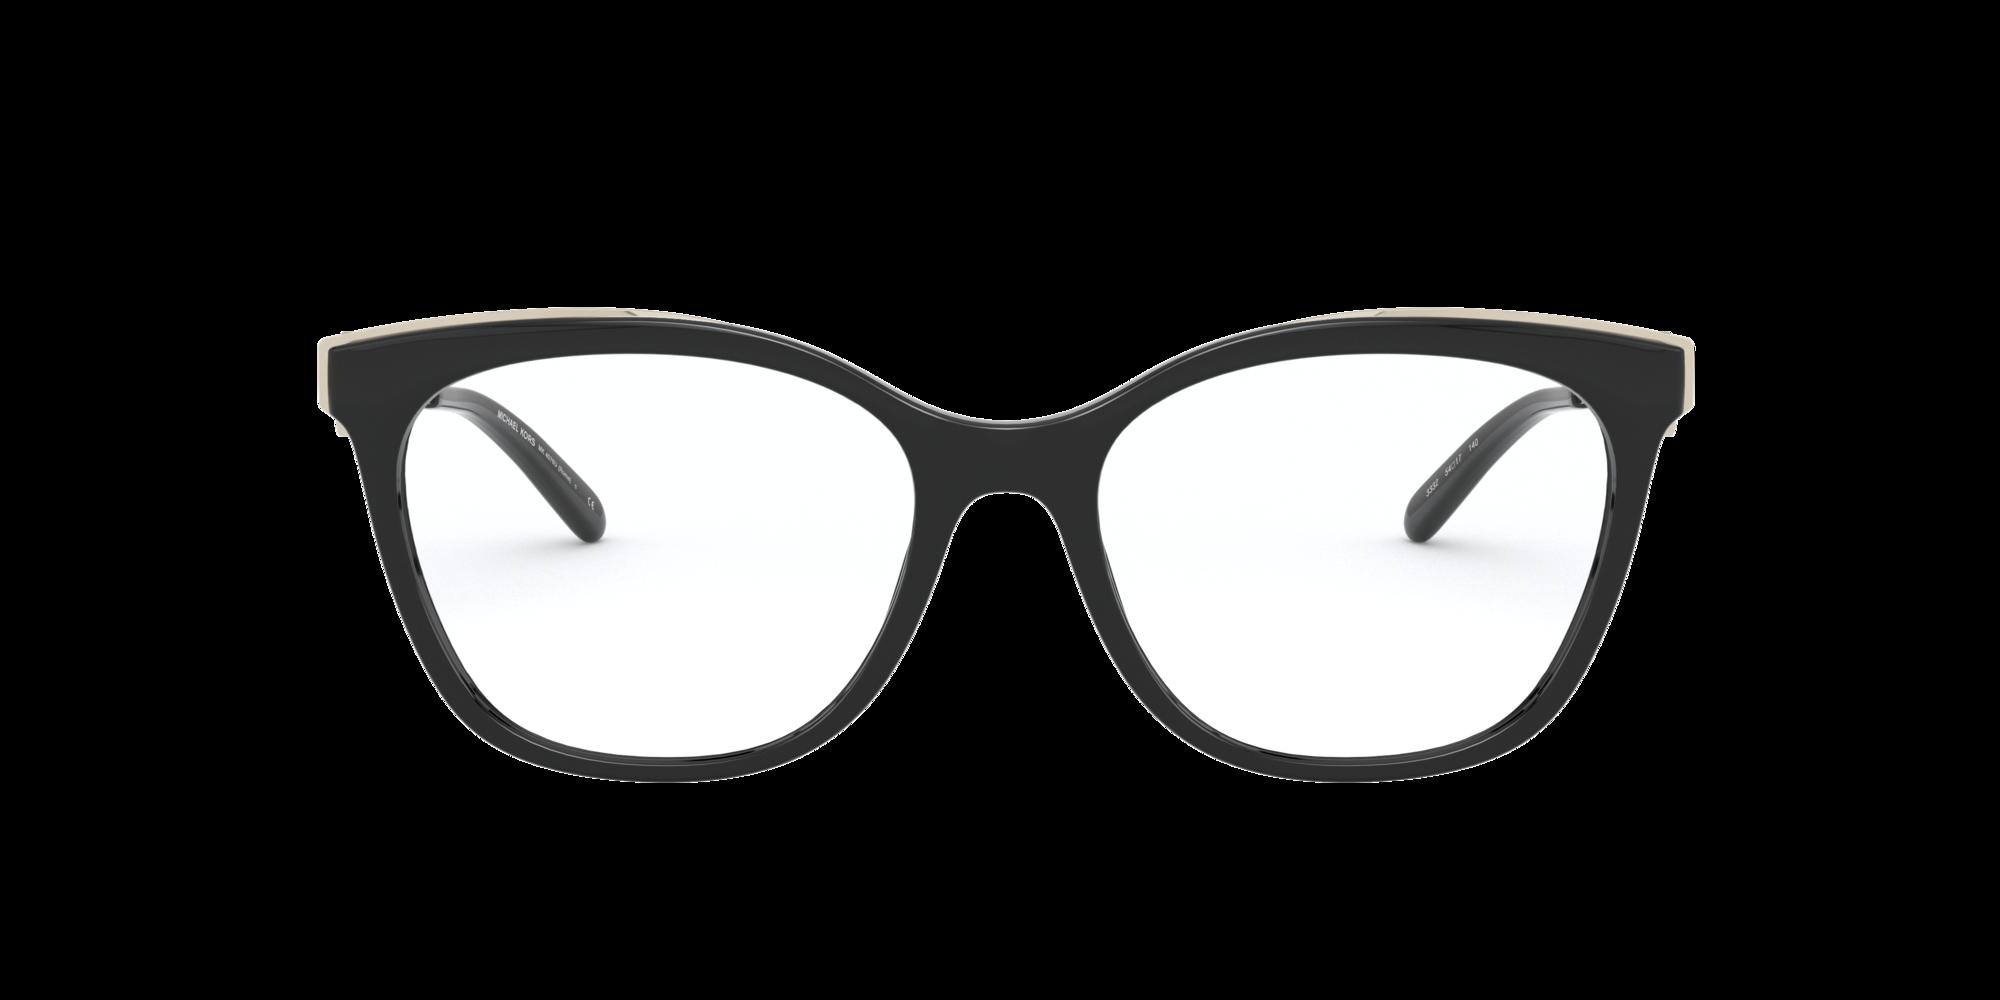 Image for MK4076U ROME from LensCrafters | Glasses, Prescription Glasses Online, Eyewear